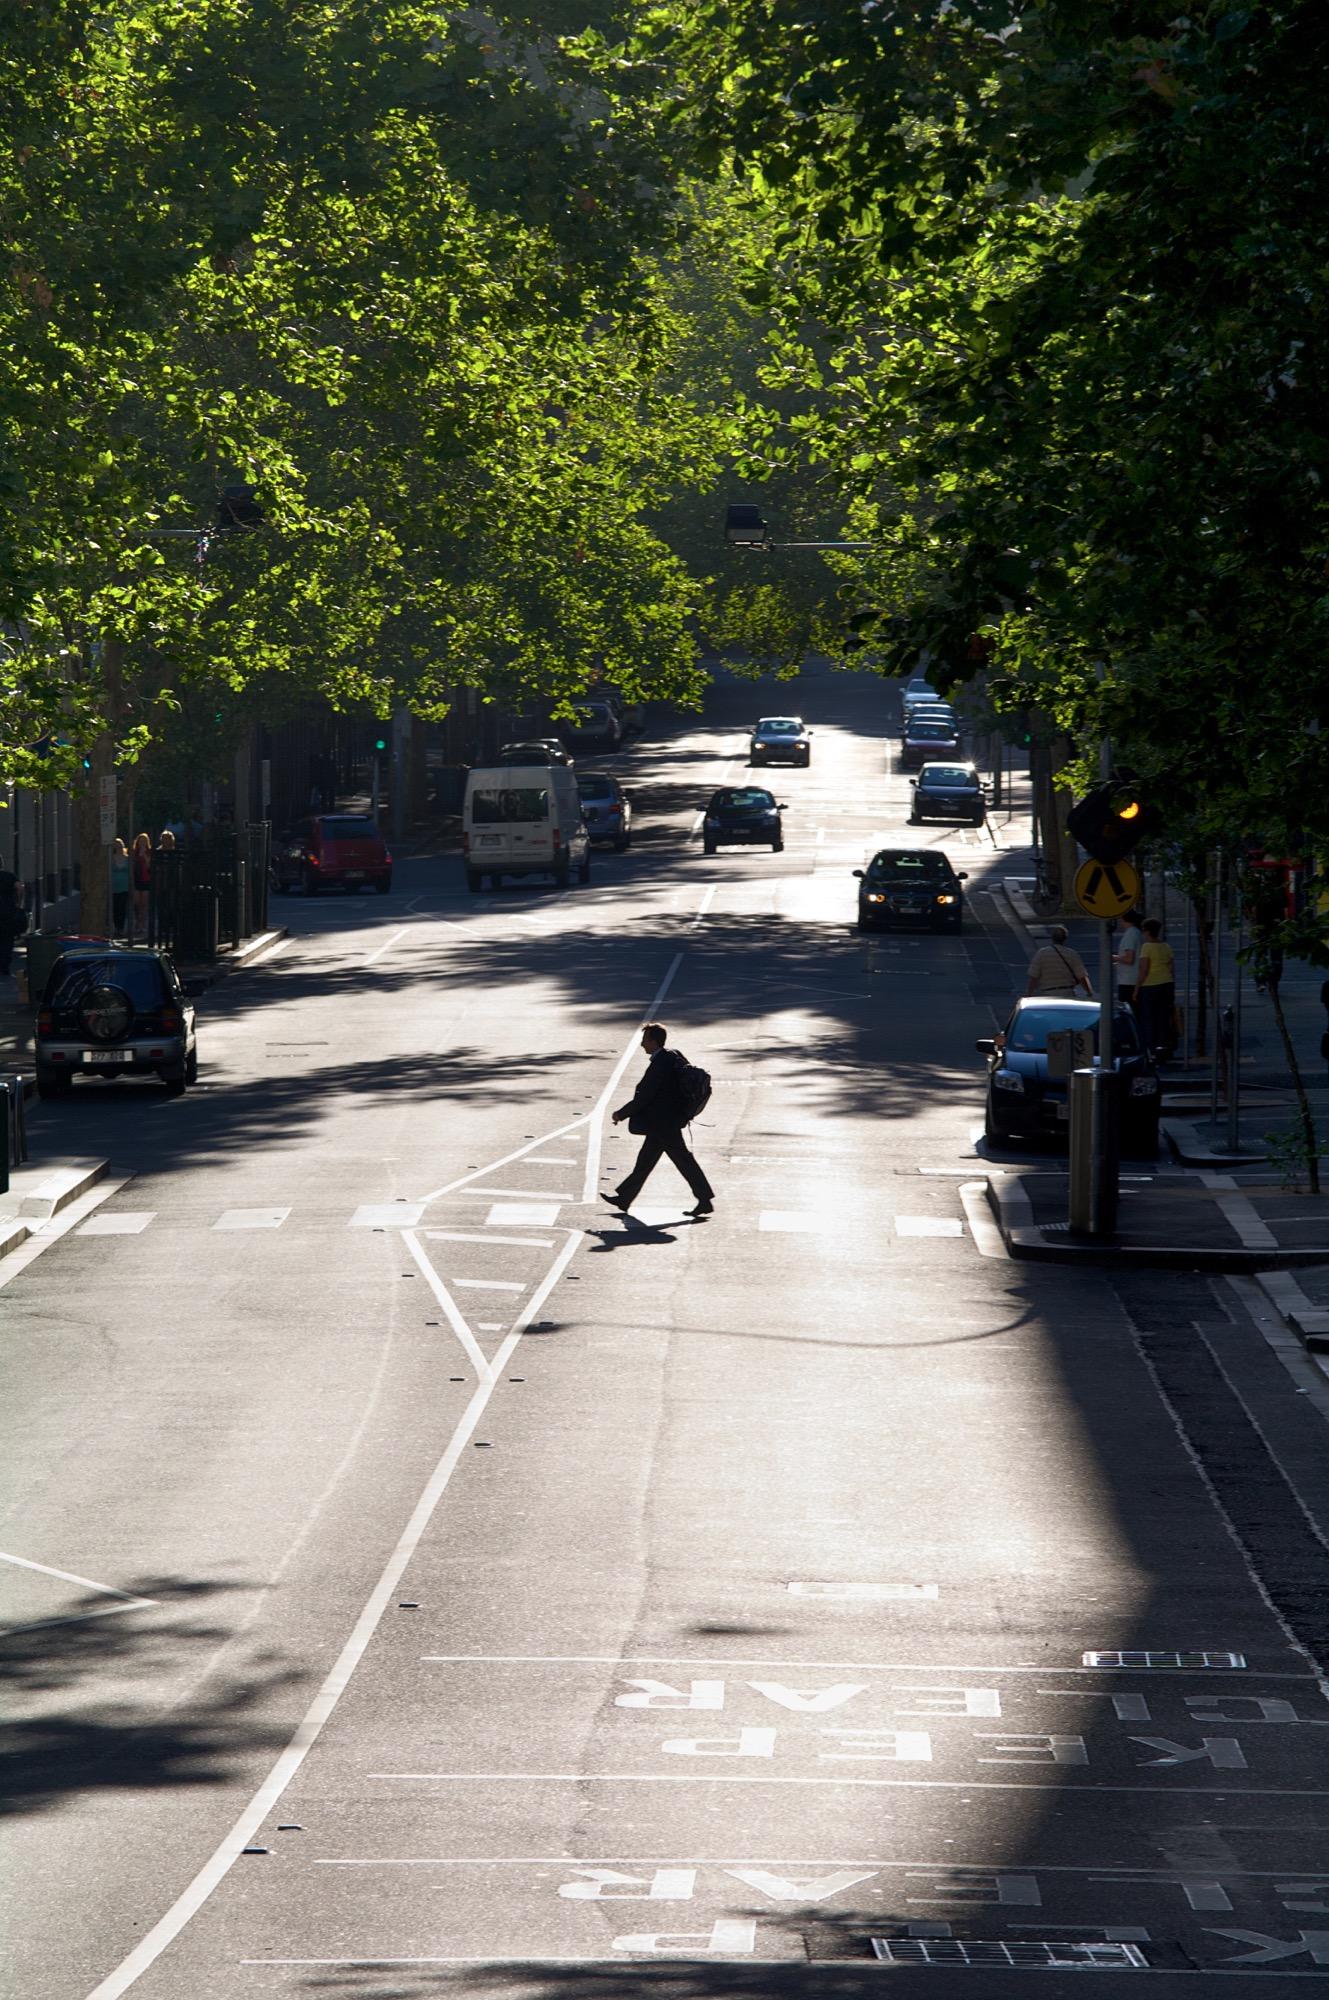 Melbourne stuff - 1 of 223 (122).jpg